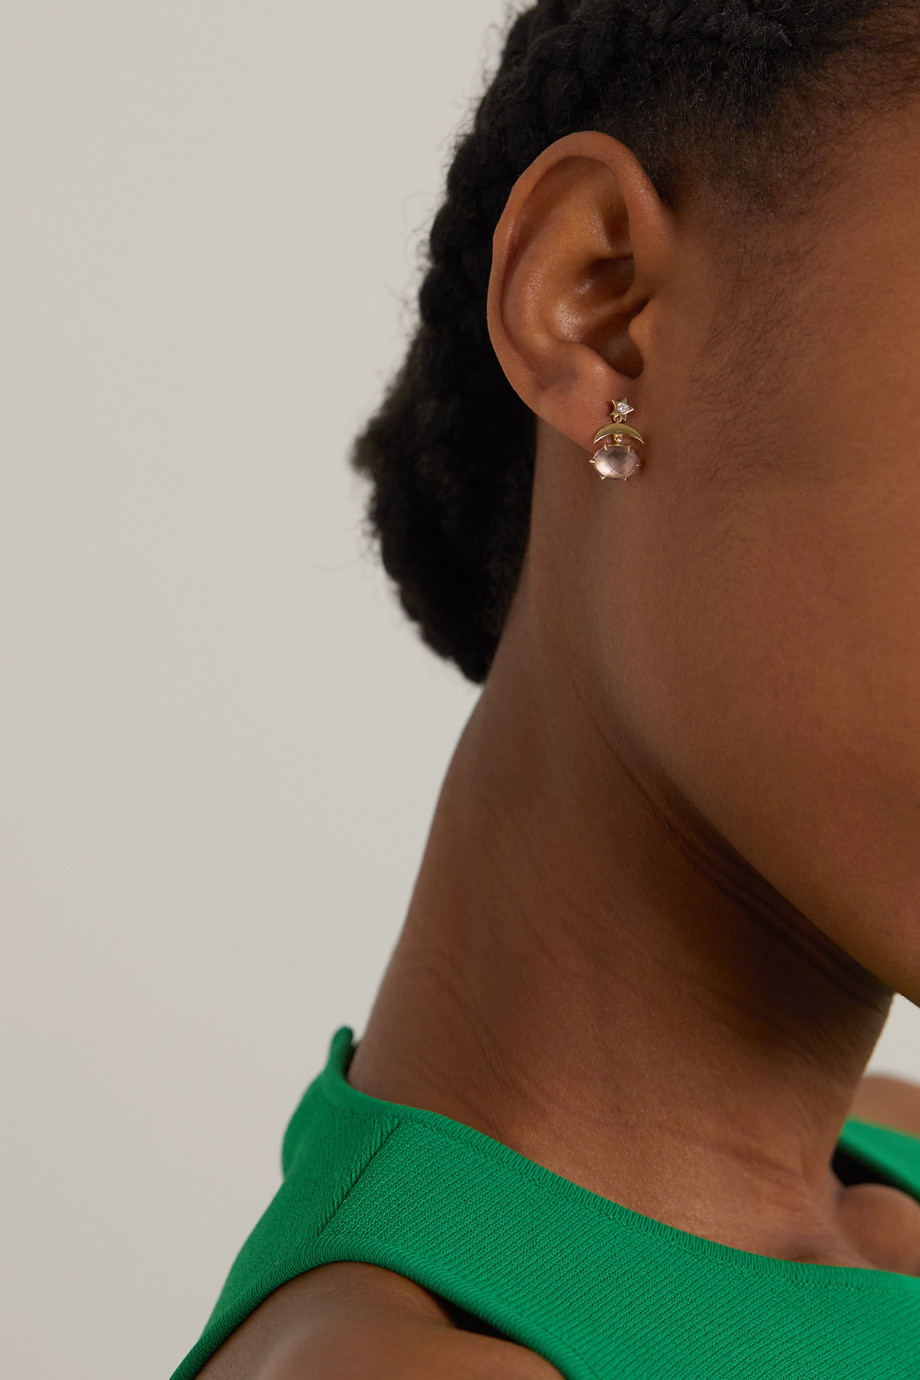 Andrea Fohrman Mini Cosmo 14-karat gold, amethyst and diamond earrings